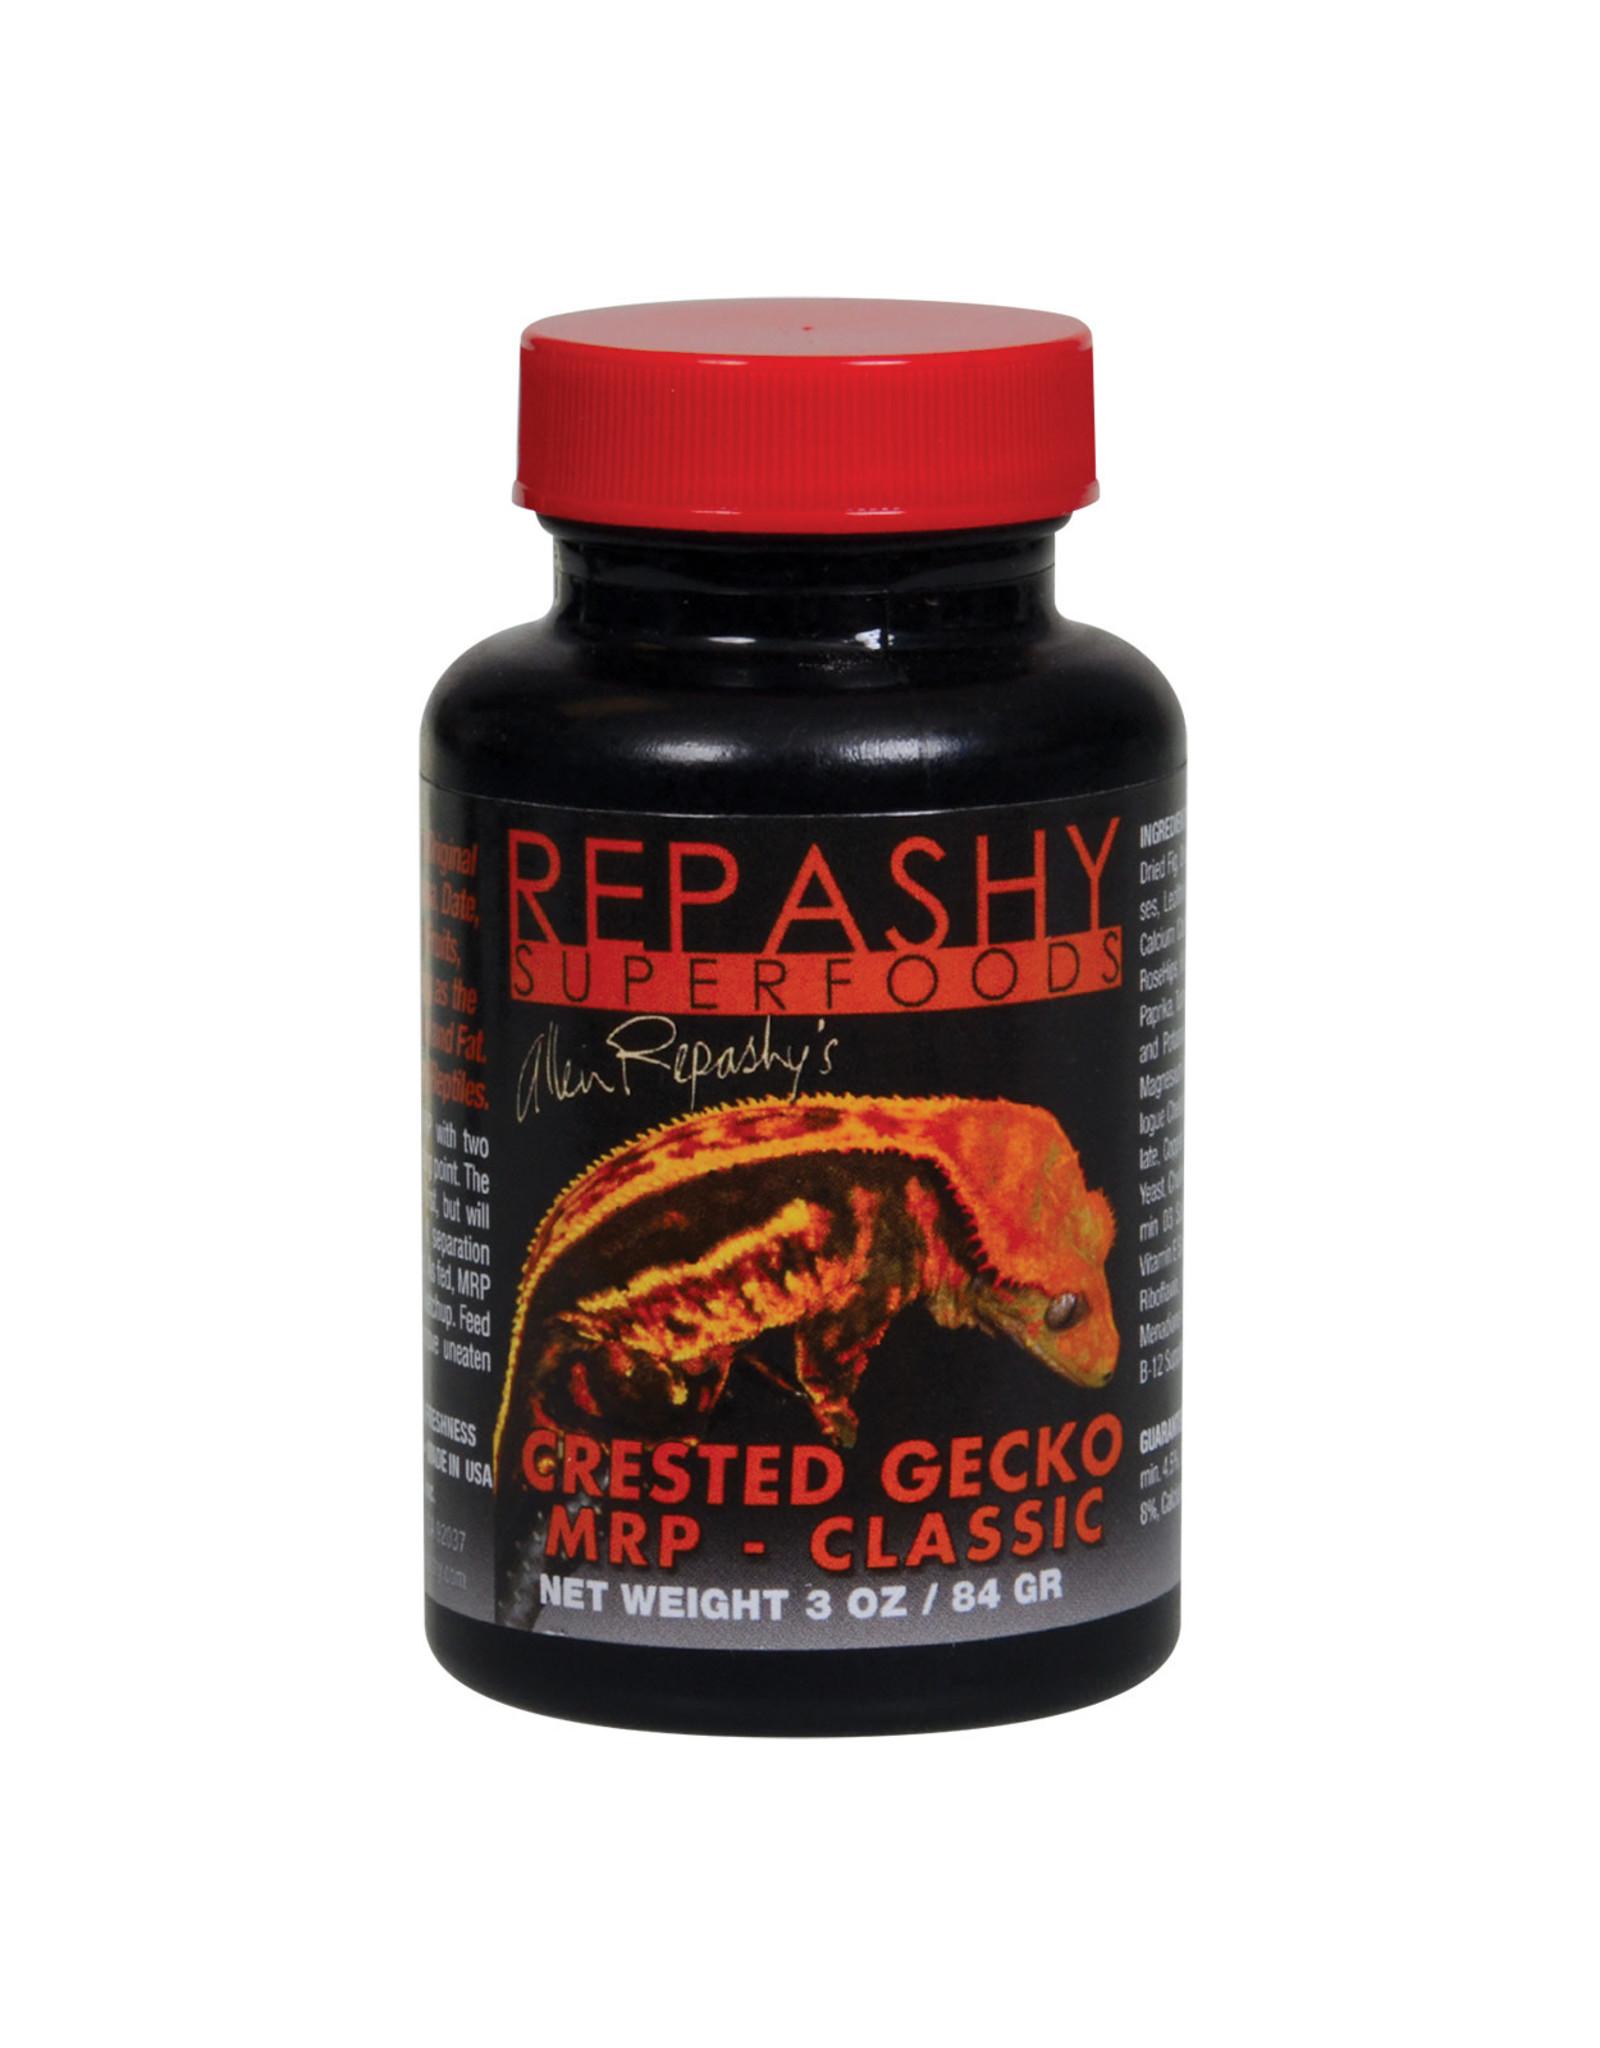 Repashy Repashy Crested Gecko MRP Classic Diet - 3 oz